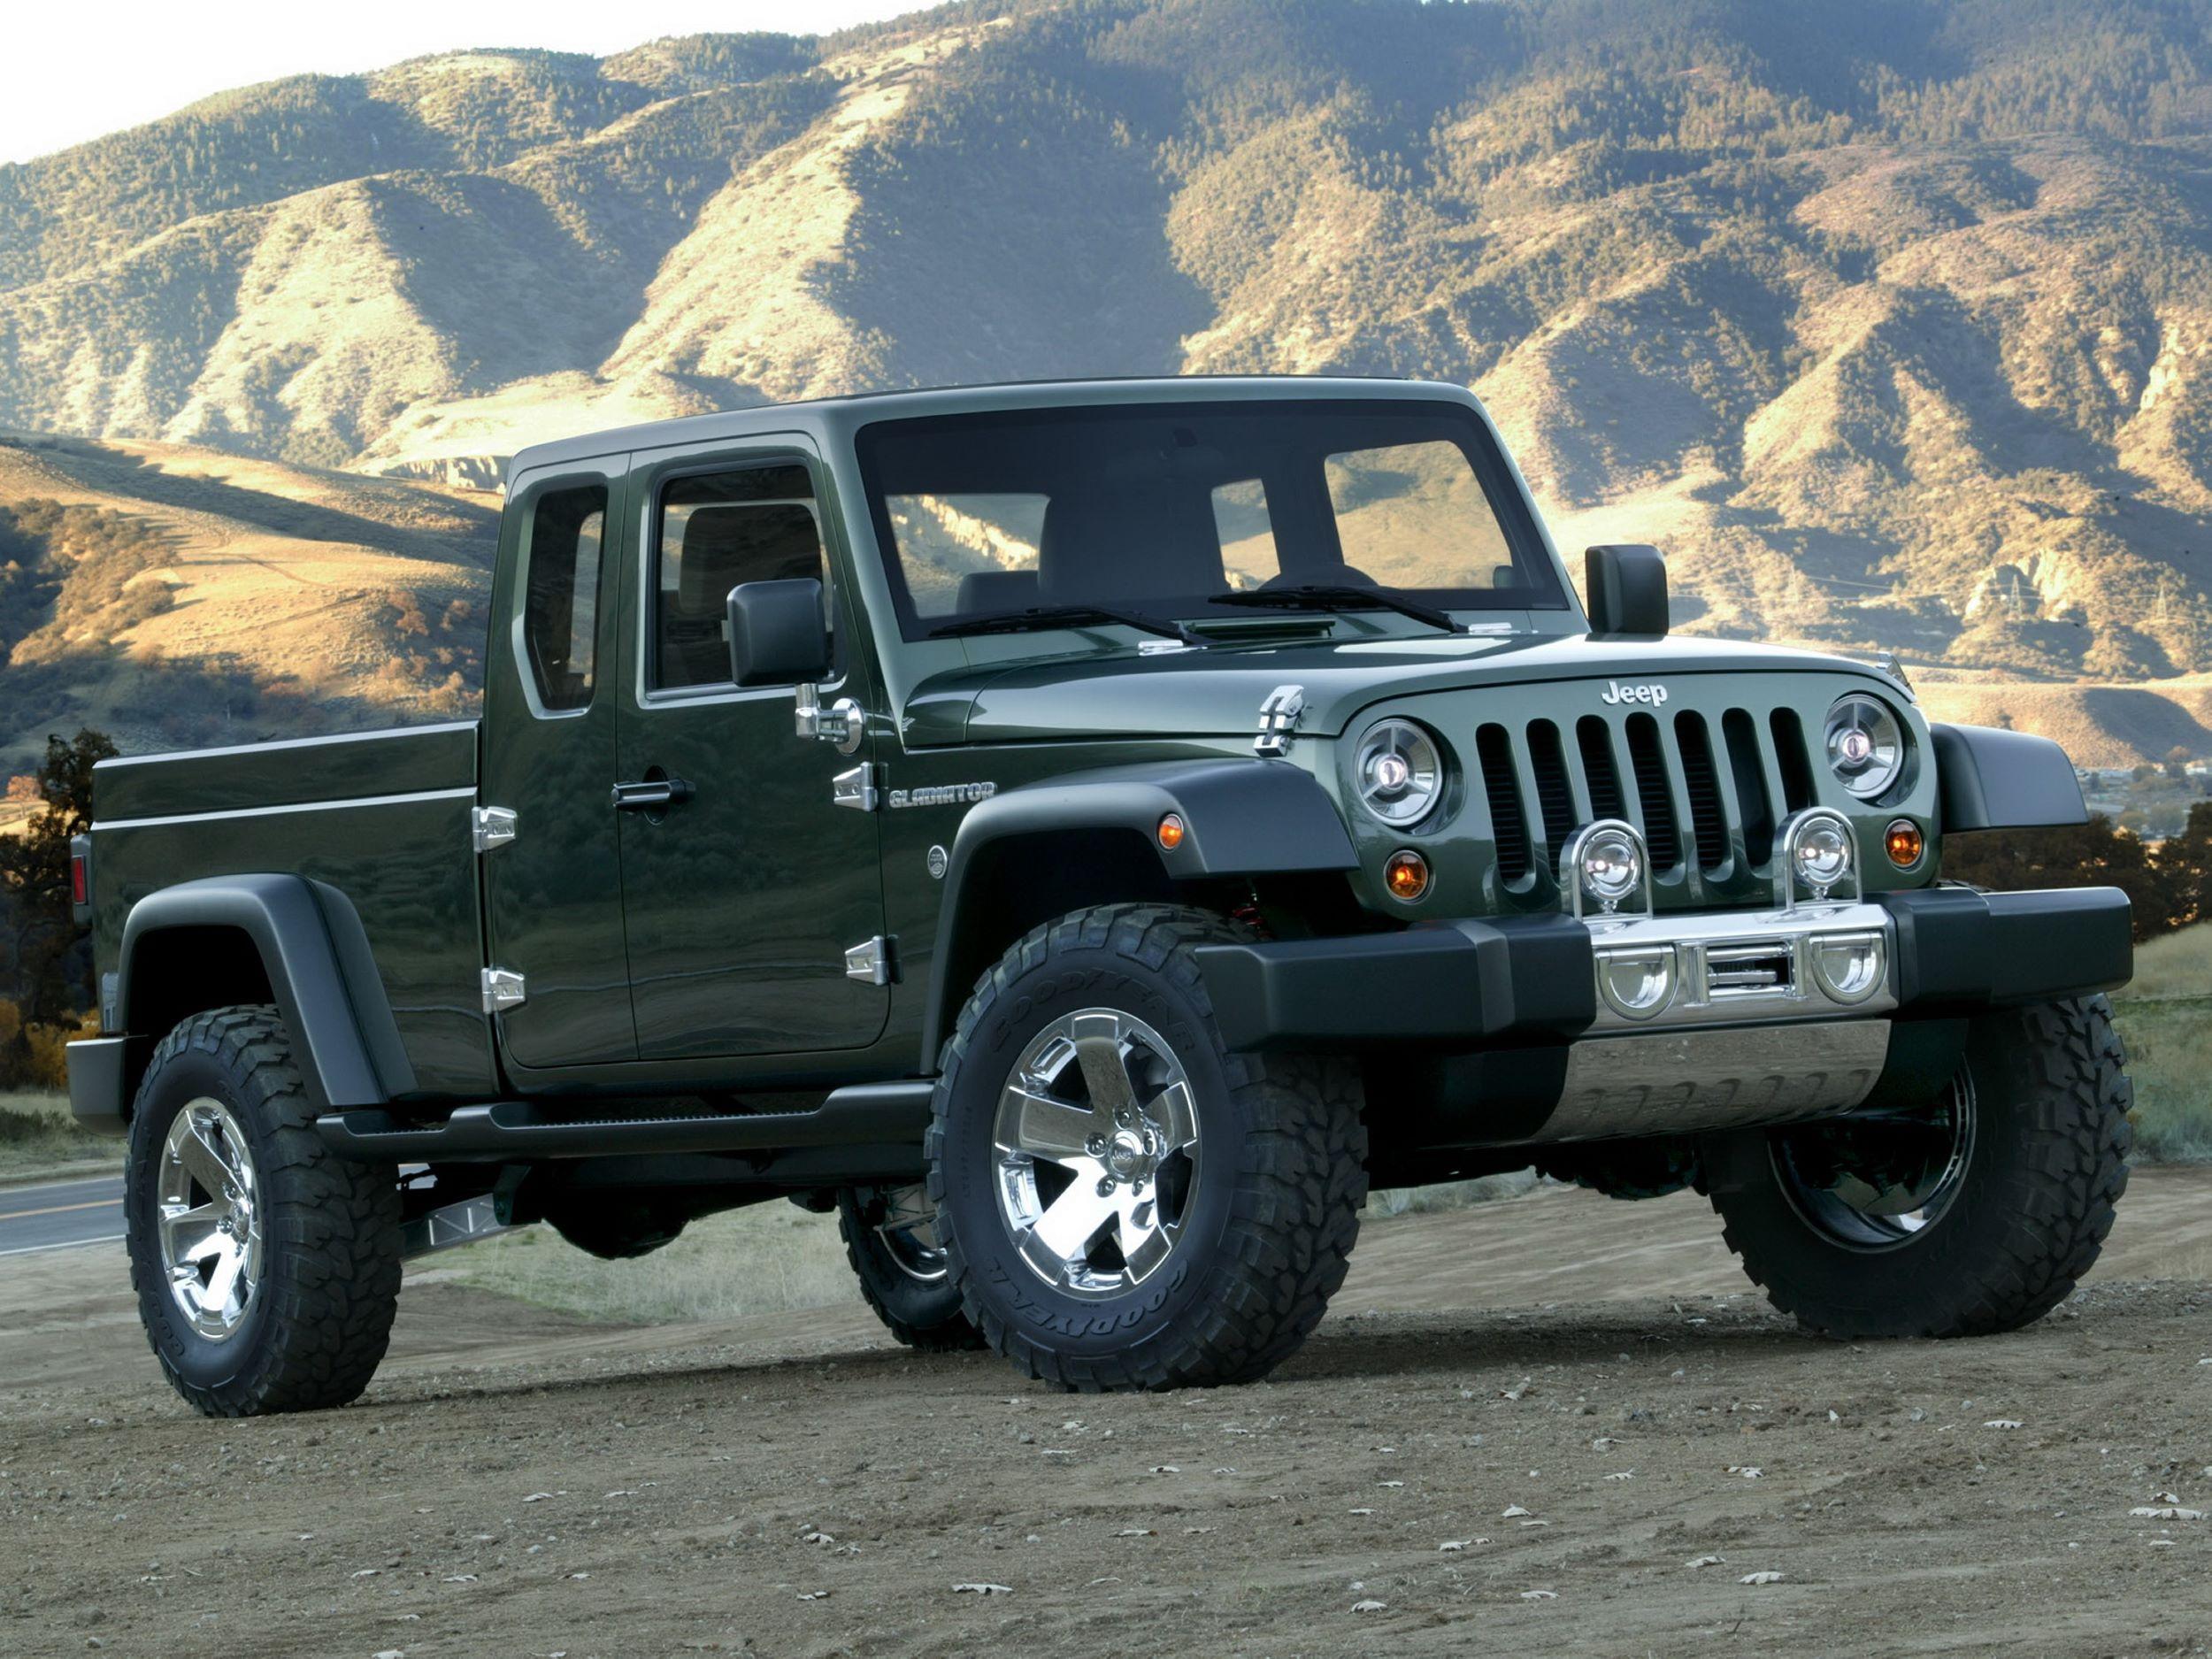 autowp.ru jeep gladiator concept 7.jpg jeep gladiator concept 7